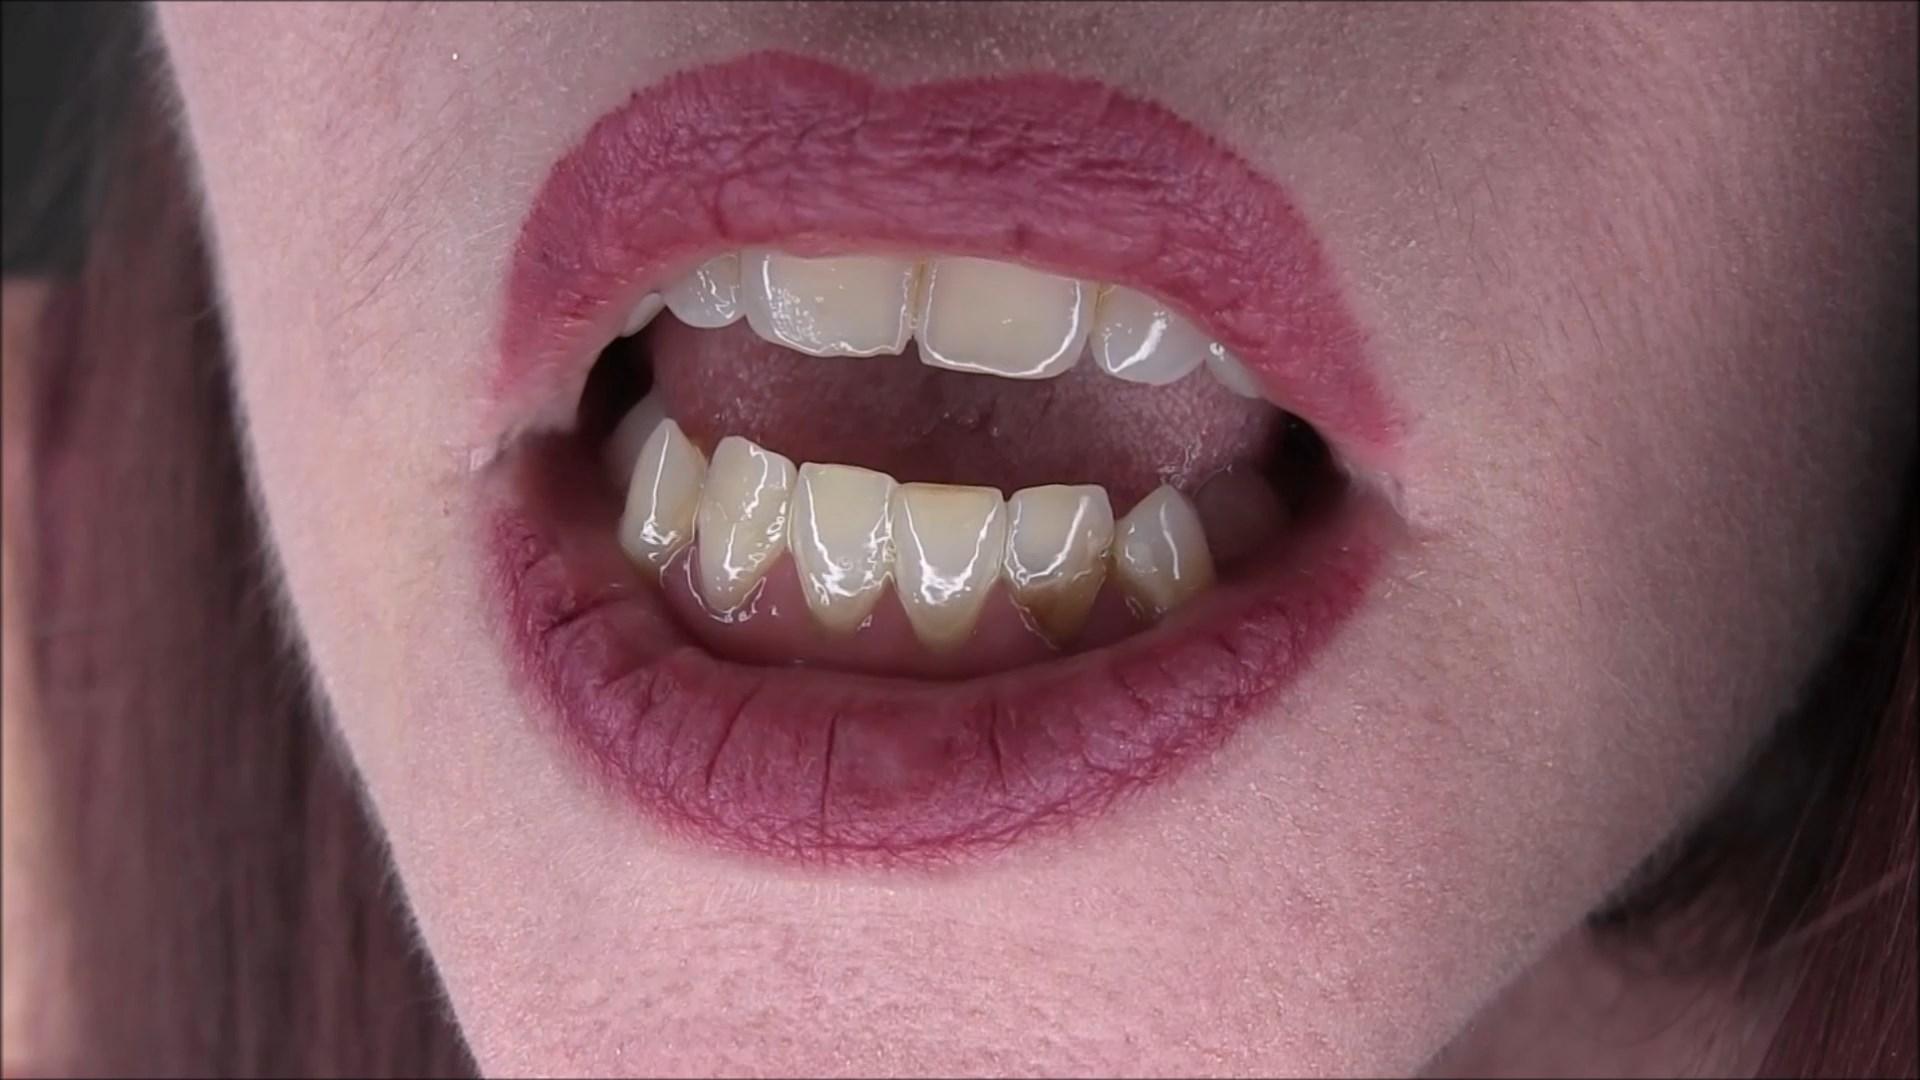 Nikki Nevaeh - Wrong, Dirty, Shameful, Taboo StepMommy-Son Love